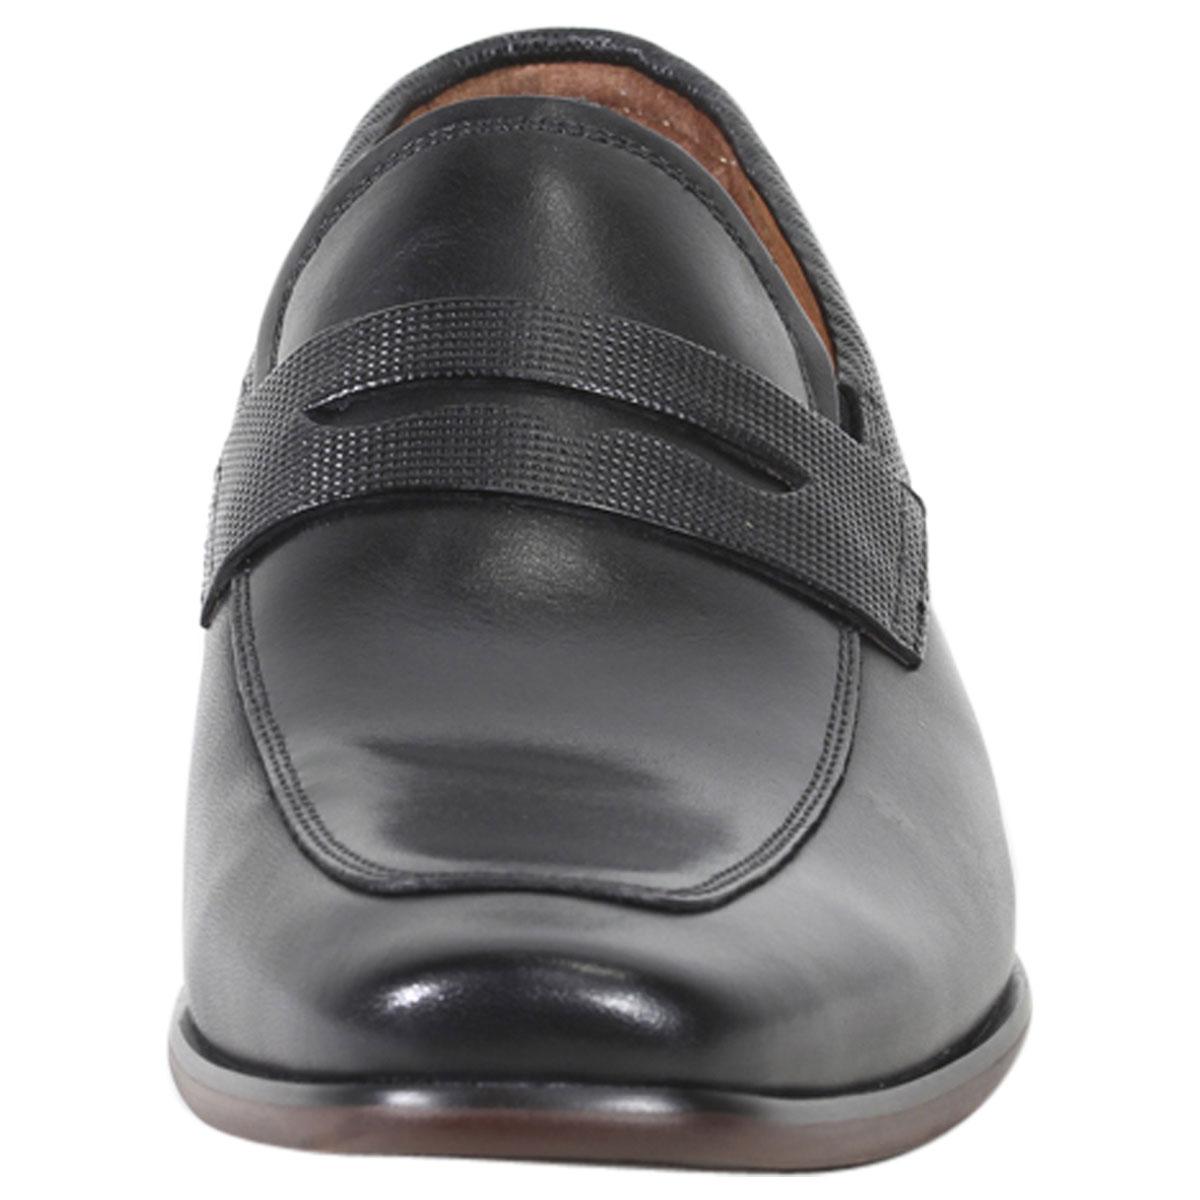 Florsheim-Men-039-s-Postino-Penny-Loafers-Shoes thumbnail 9